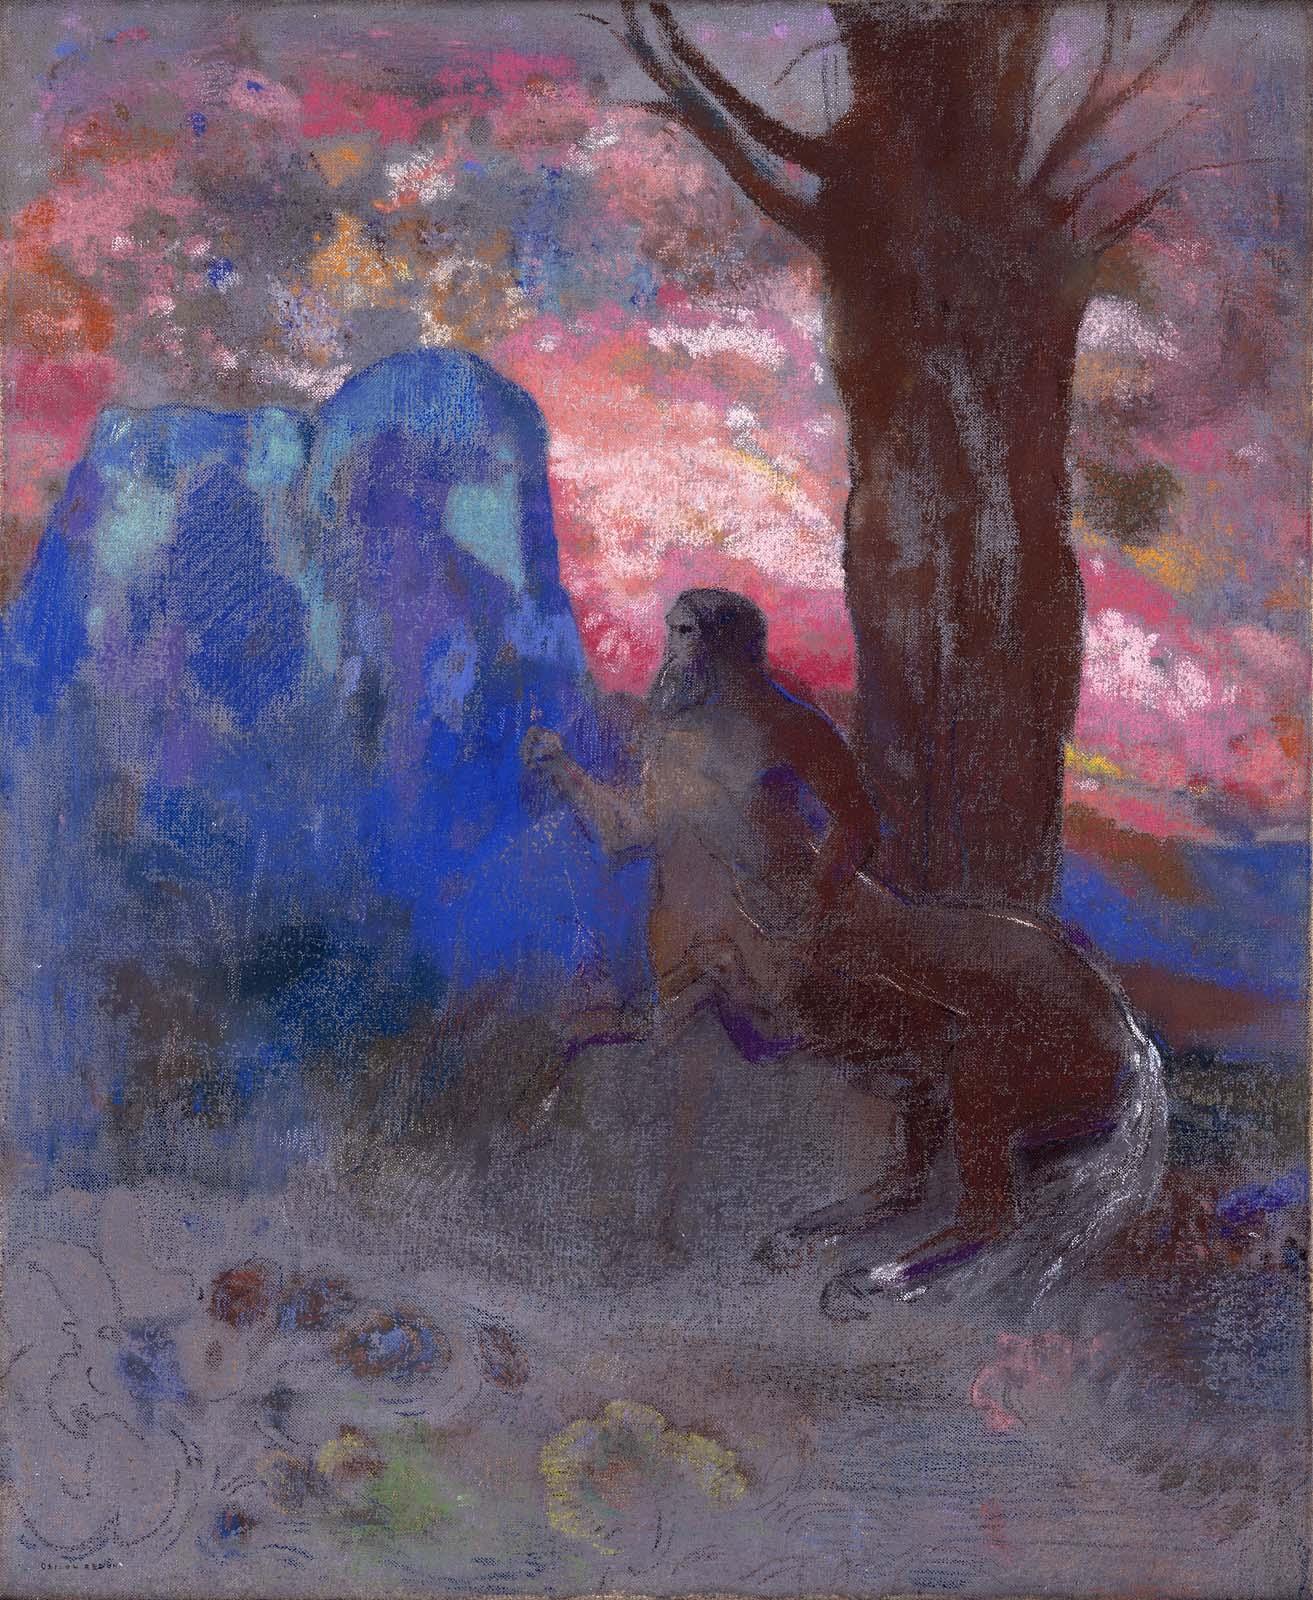 odilon-redon-centaur-1900-trivium-art-history